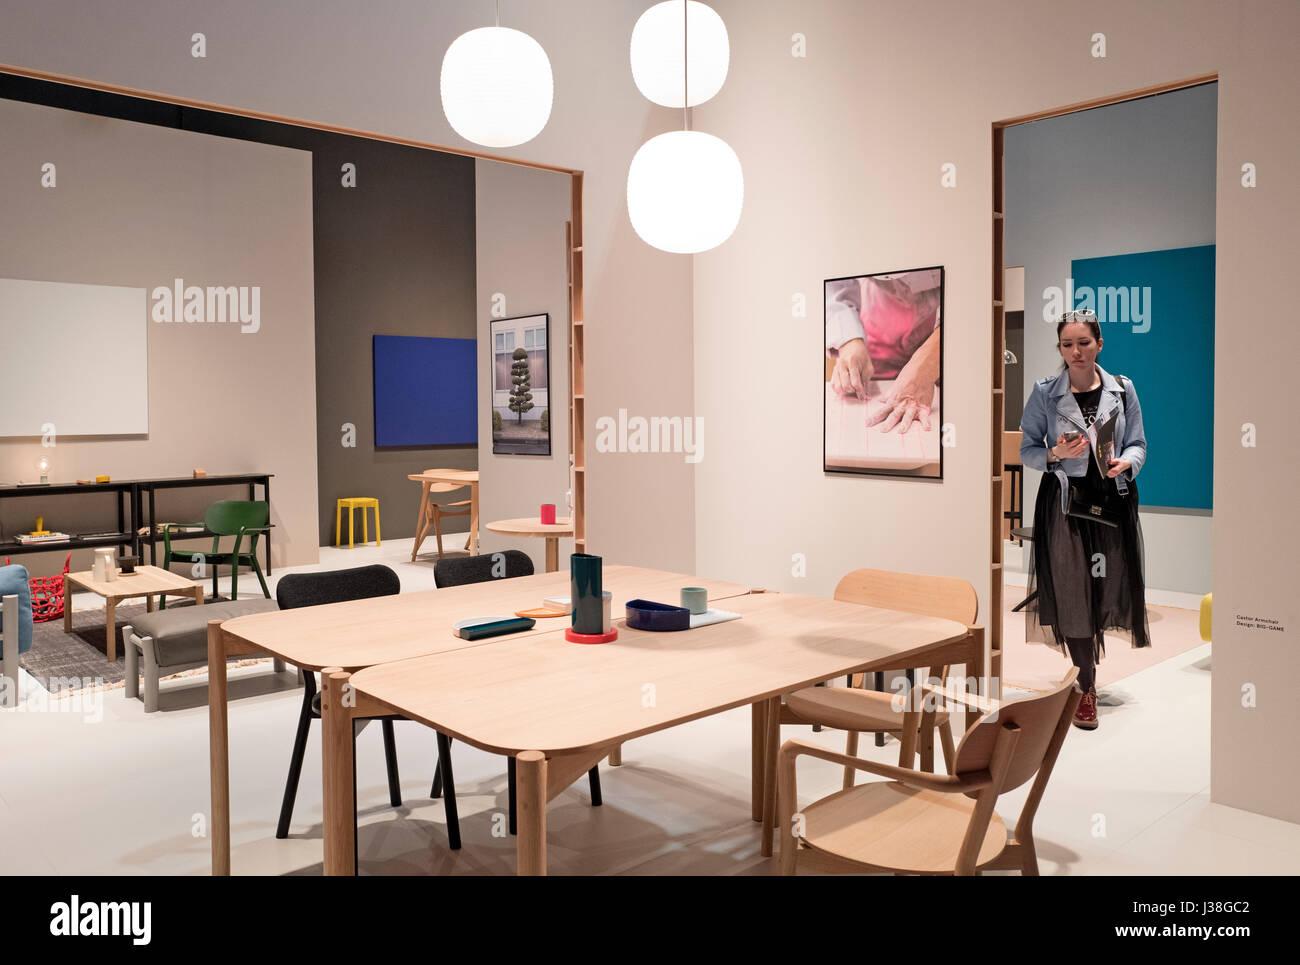 Genial Milan April, 2017: Interior Design Furniture At The International Design  Week Salone Del Mobile, In Milan, Italy.